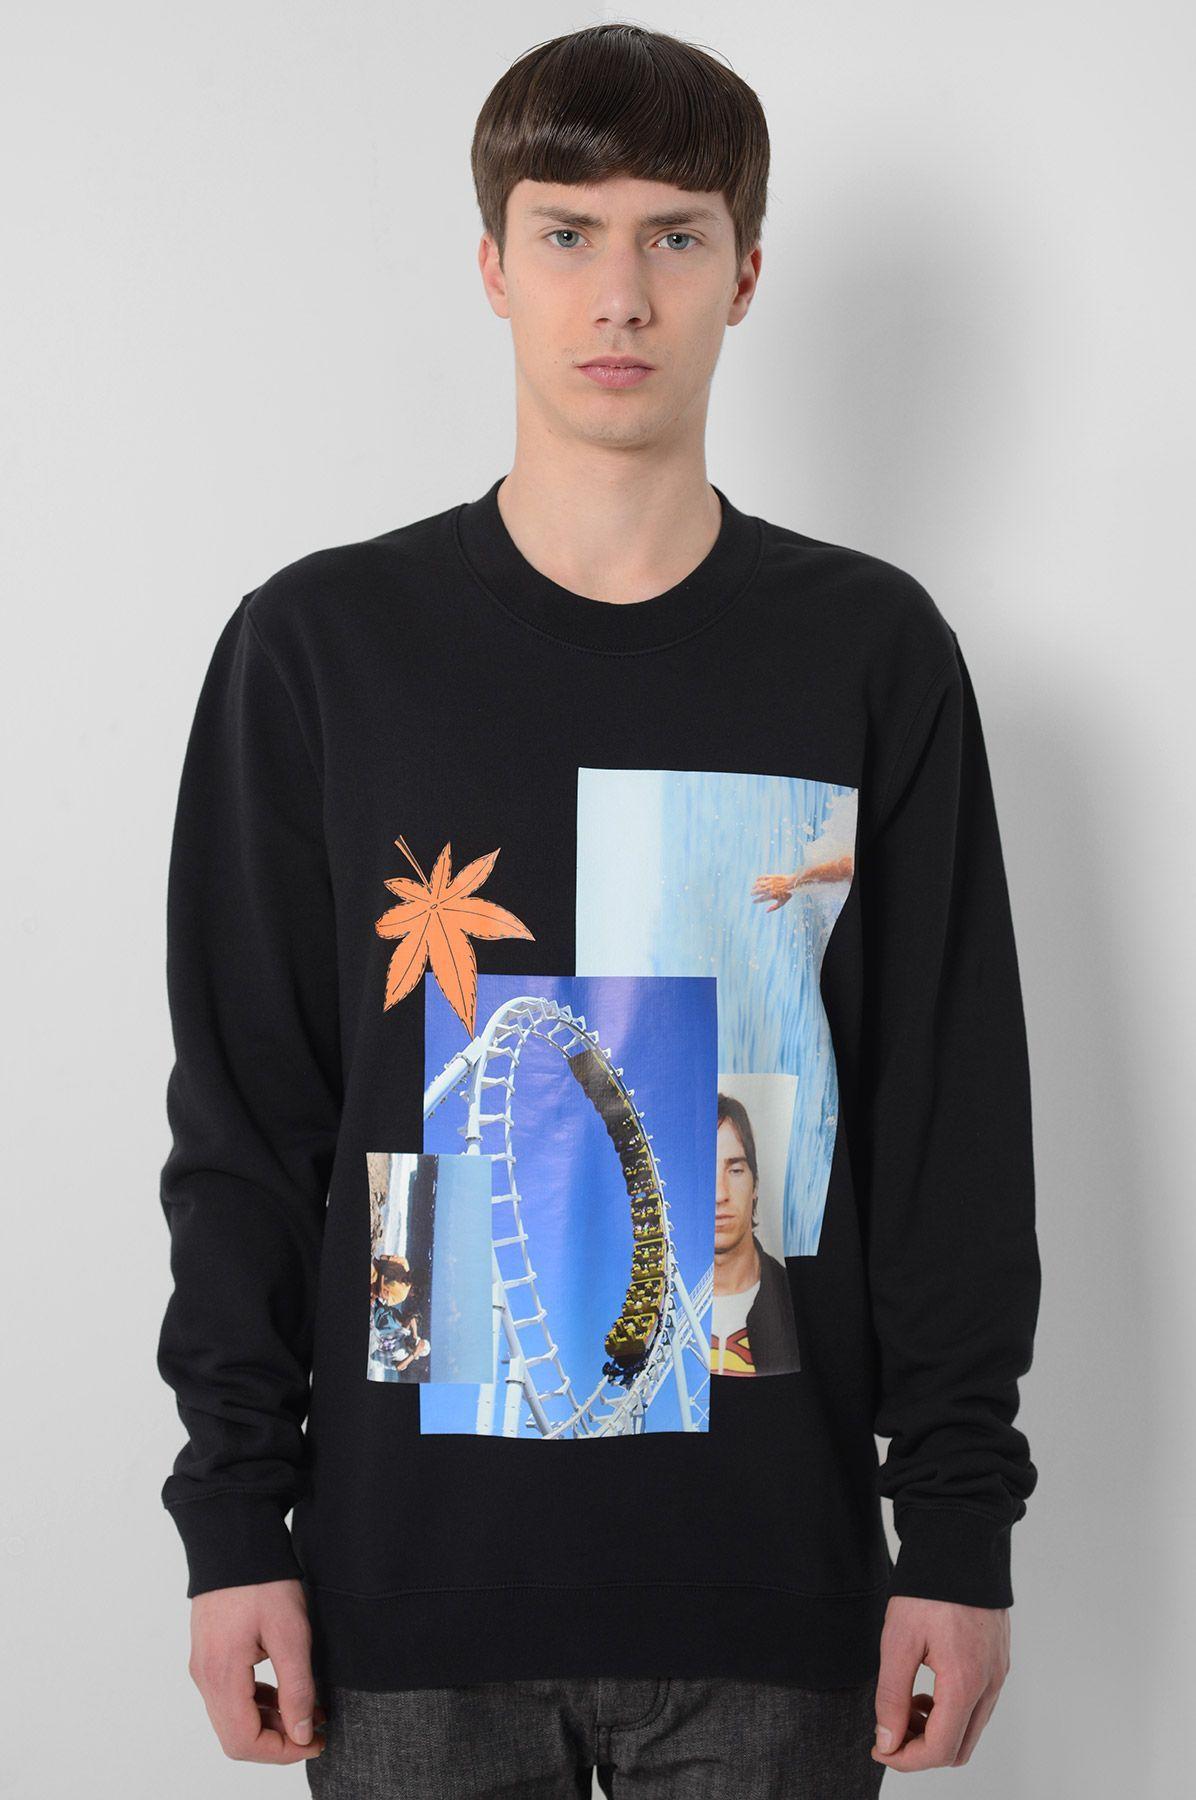 Rollacoaster Sweatshirt by Raf Simons